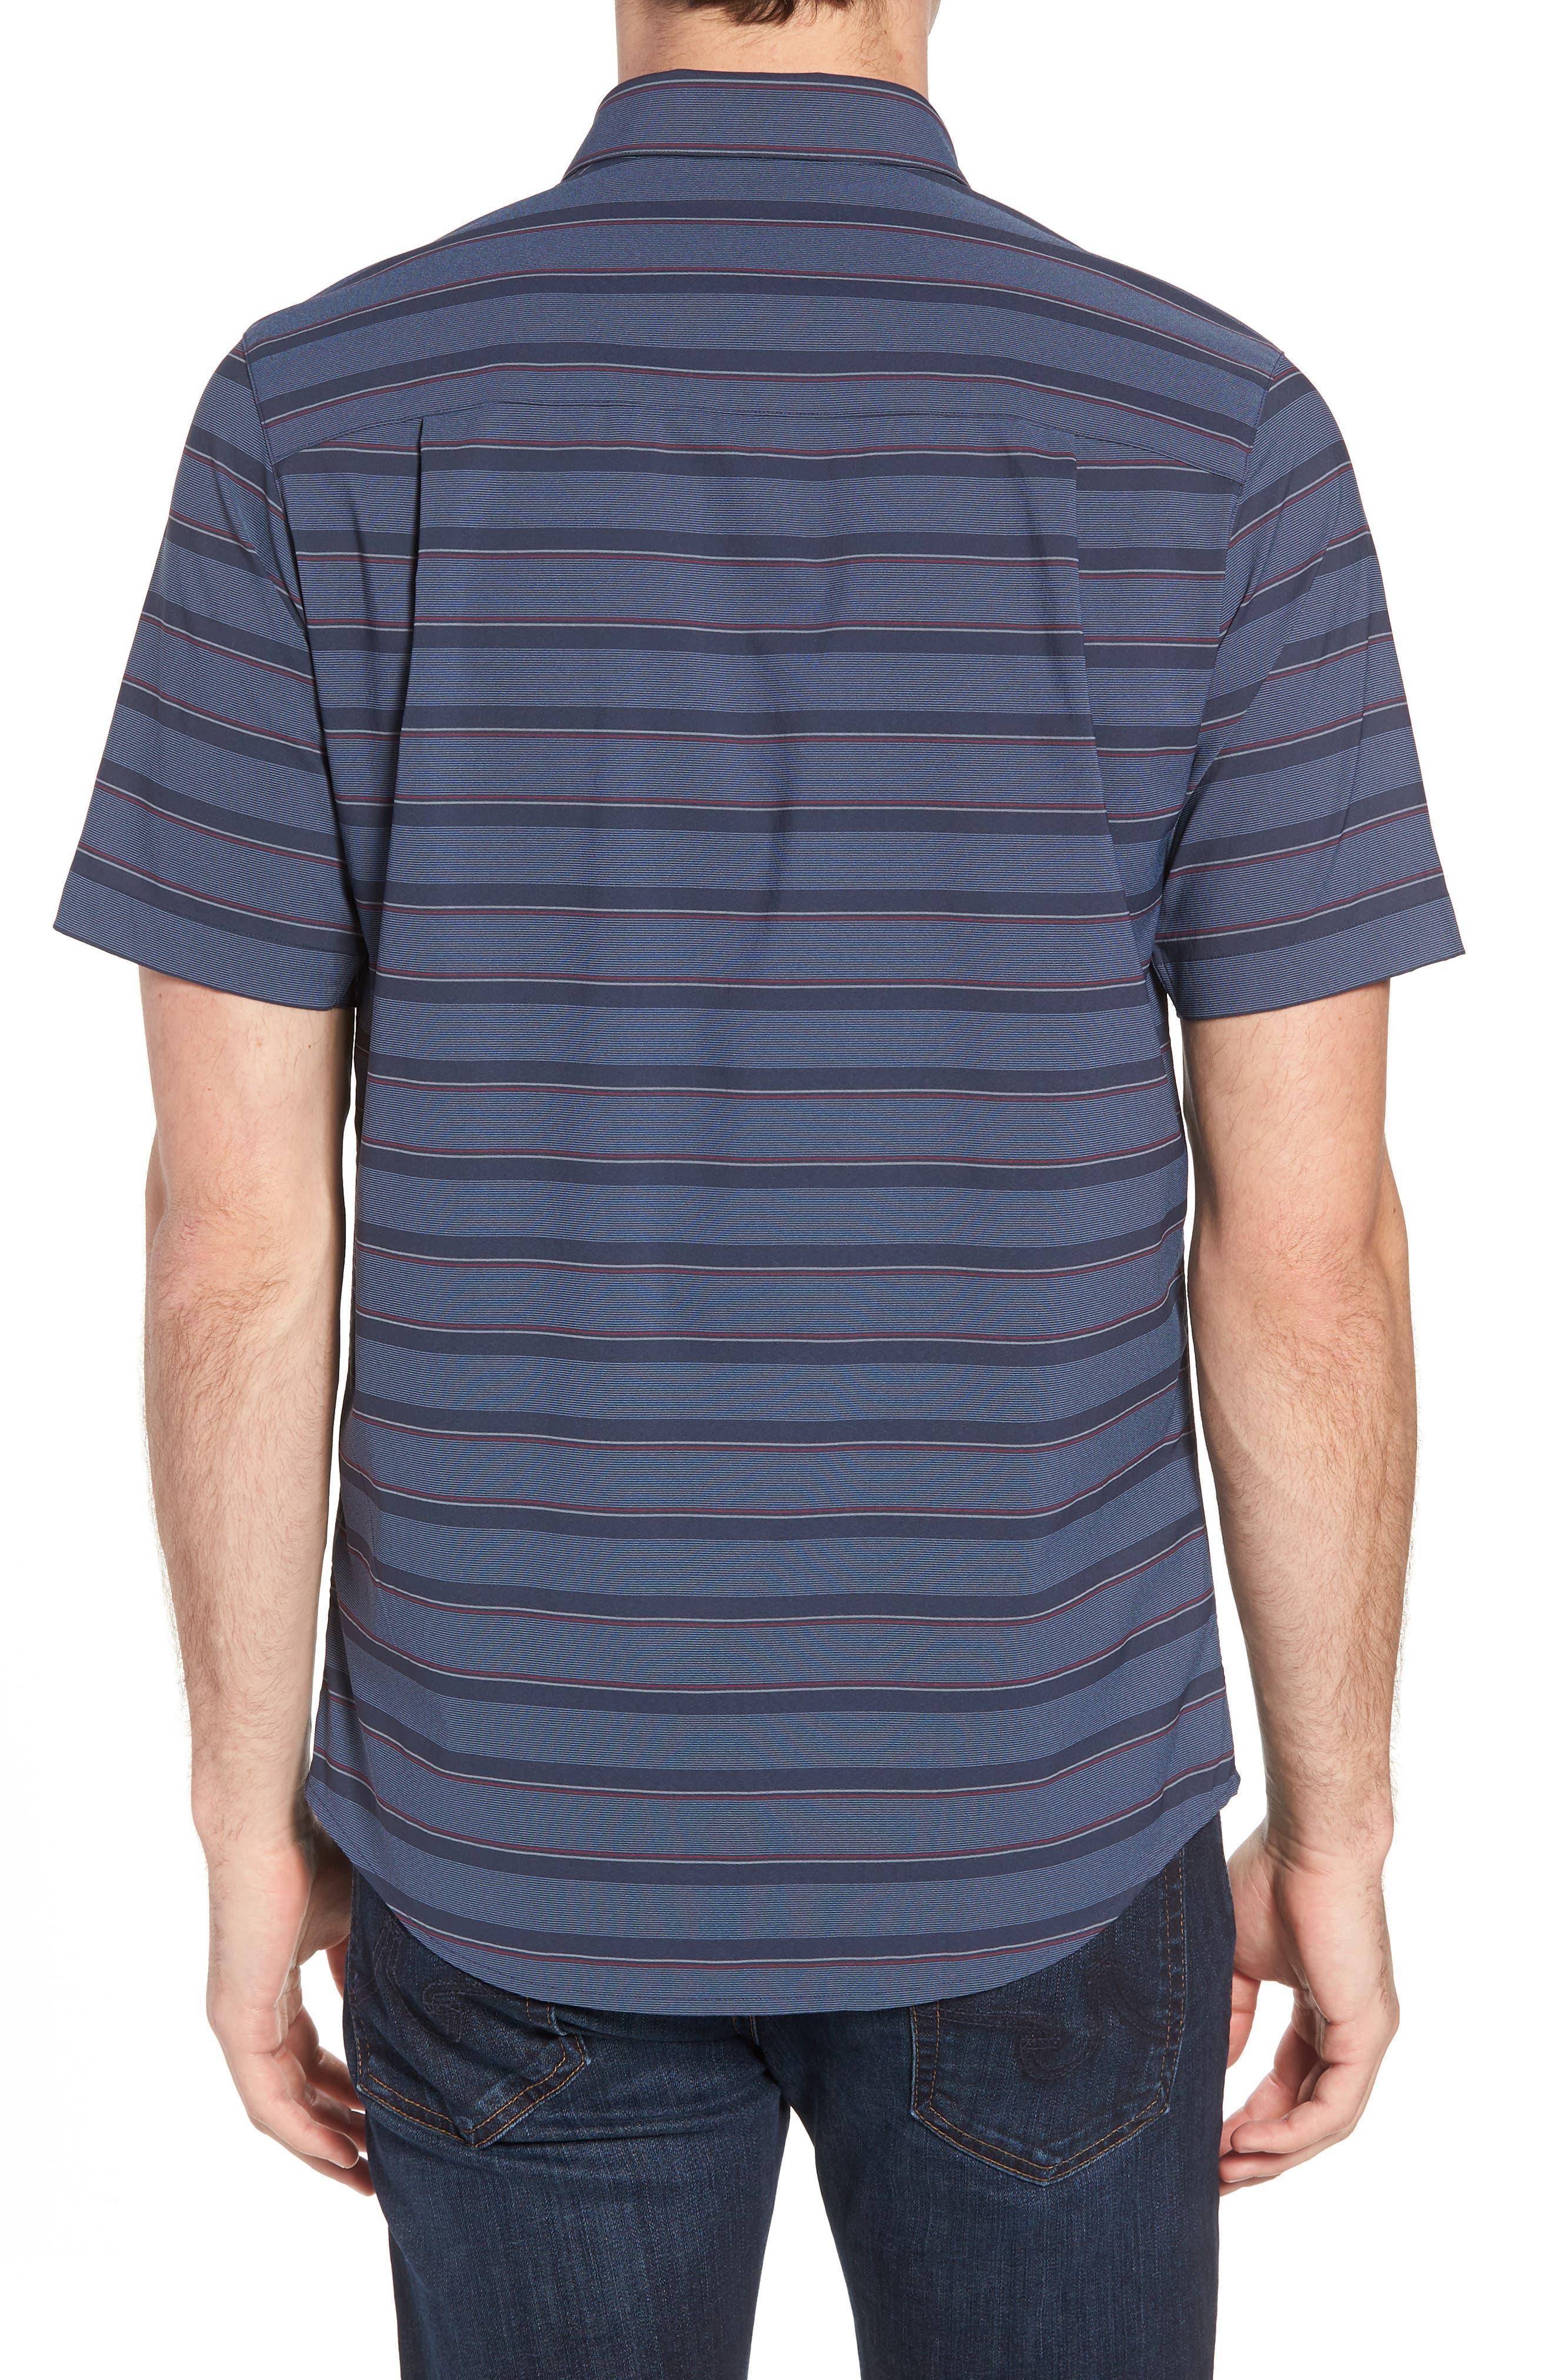 Quiver Regular Fit Sport Shirt,                             Alternate thumbnail 3, color,                             Blue Nights